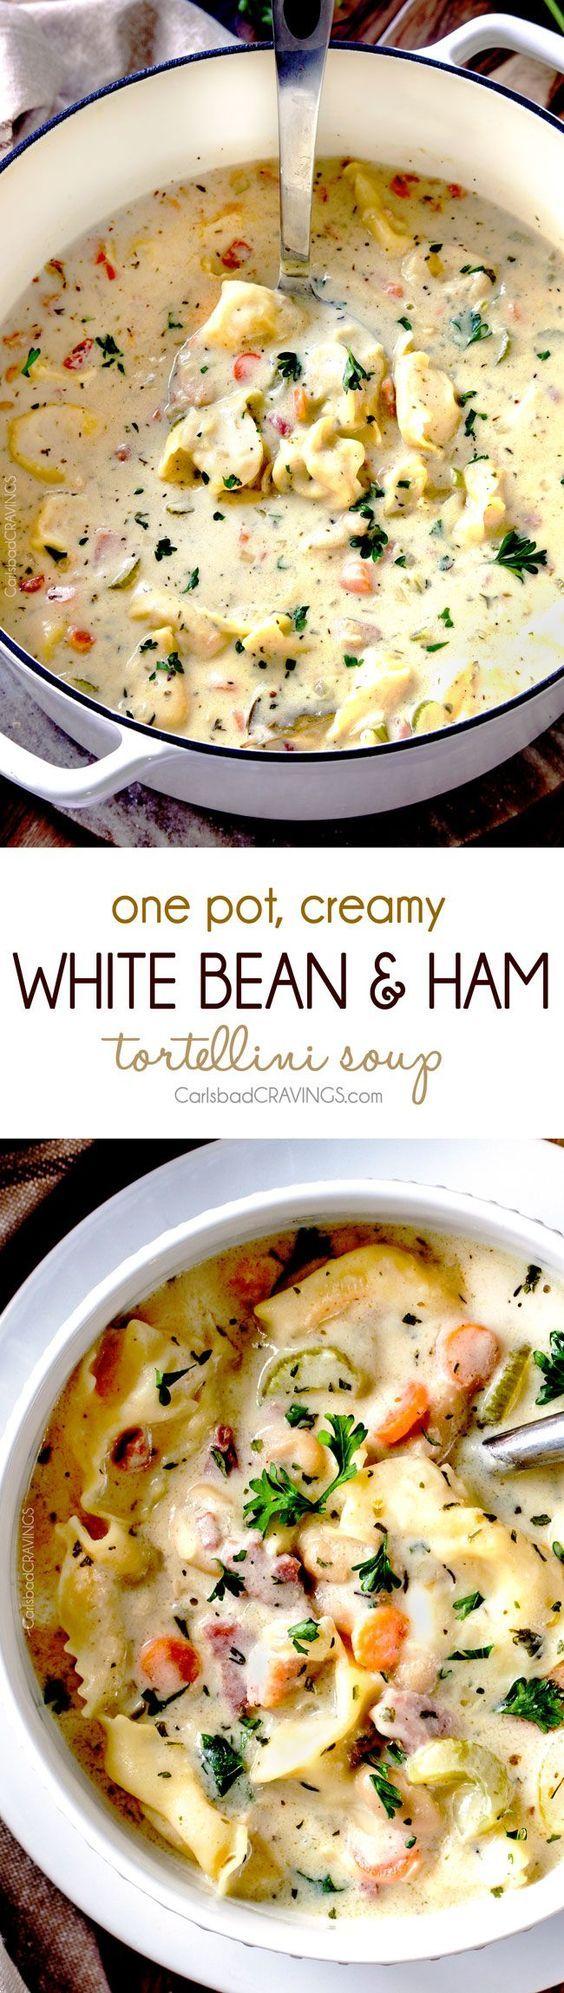 One Pot Creamy White Bean and Ham, Tortellini Soup Recipe | Carlsbad Cravings